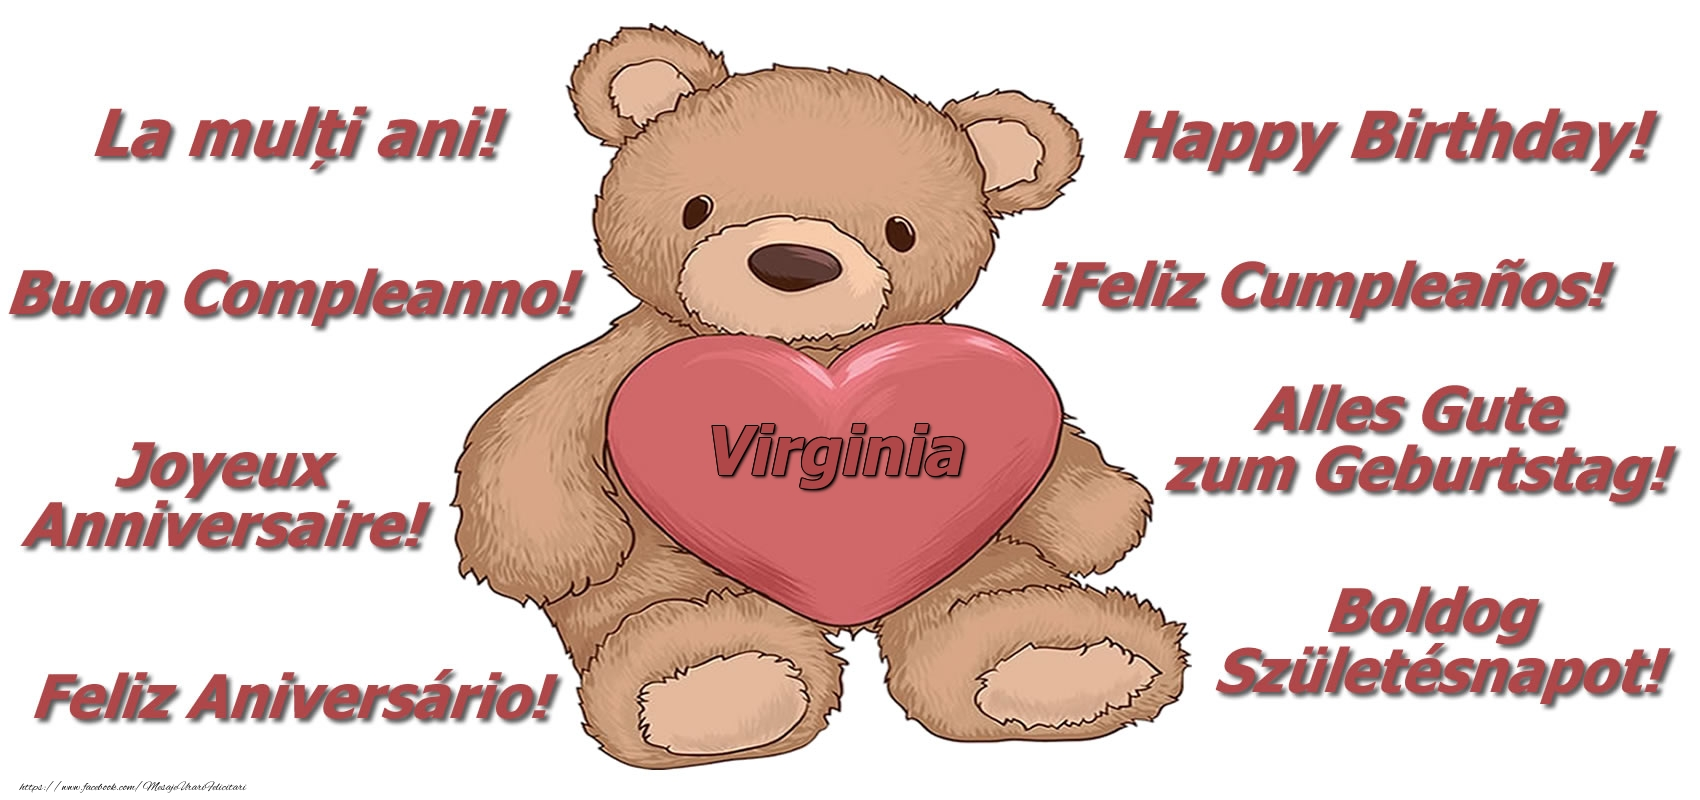 Felicitari de zi de nastere - La multi ani Virginia! - Ursulet